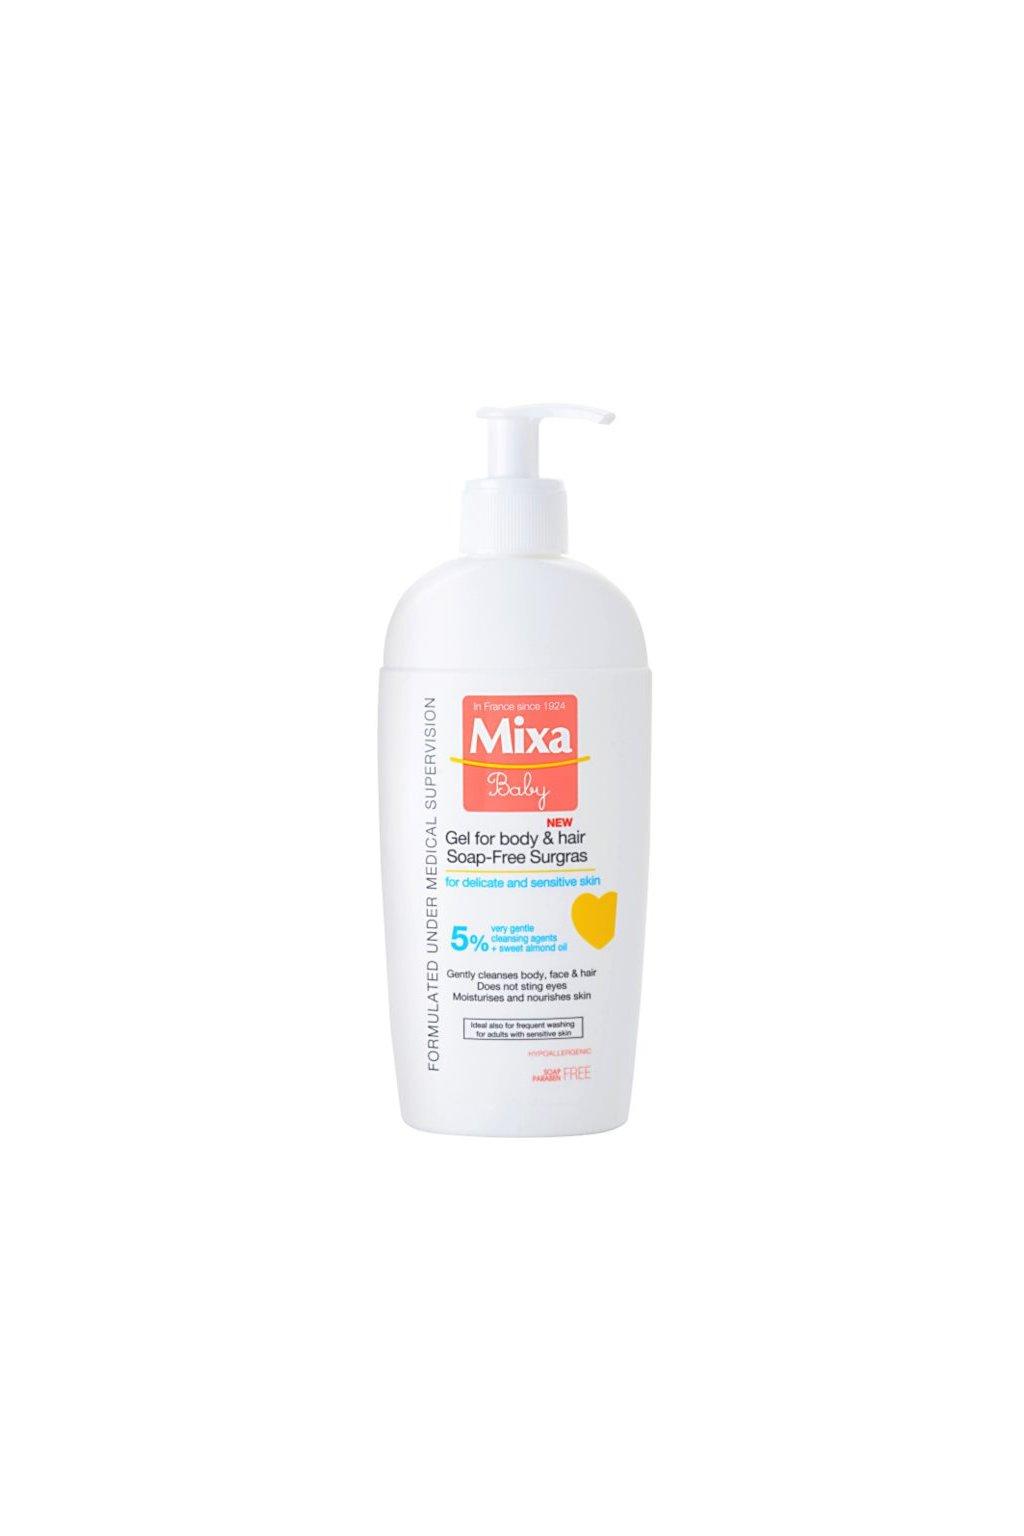 mixa baby sprchovy gel a sampon 2 v 1 pro deti